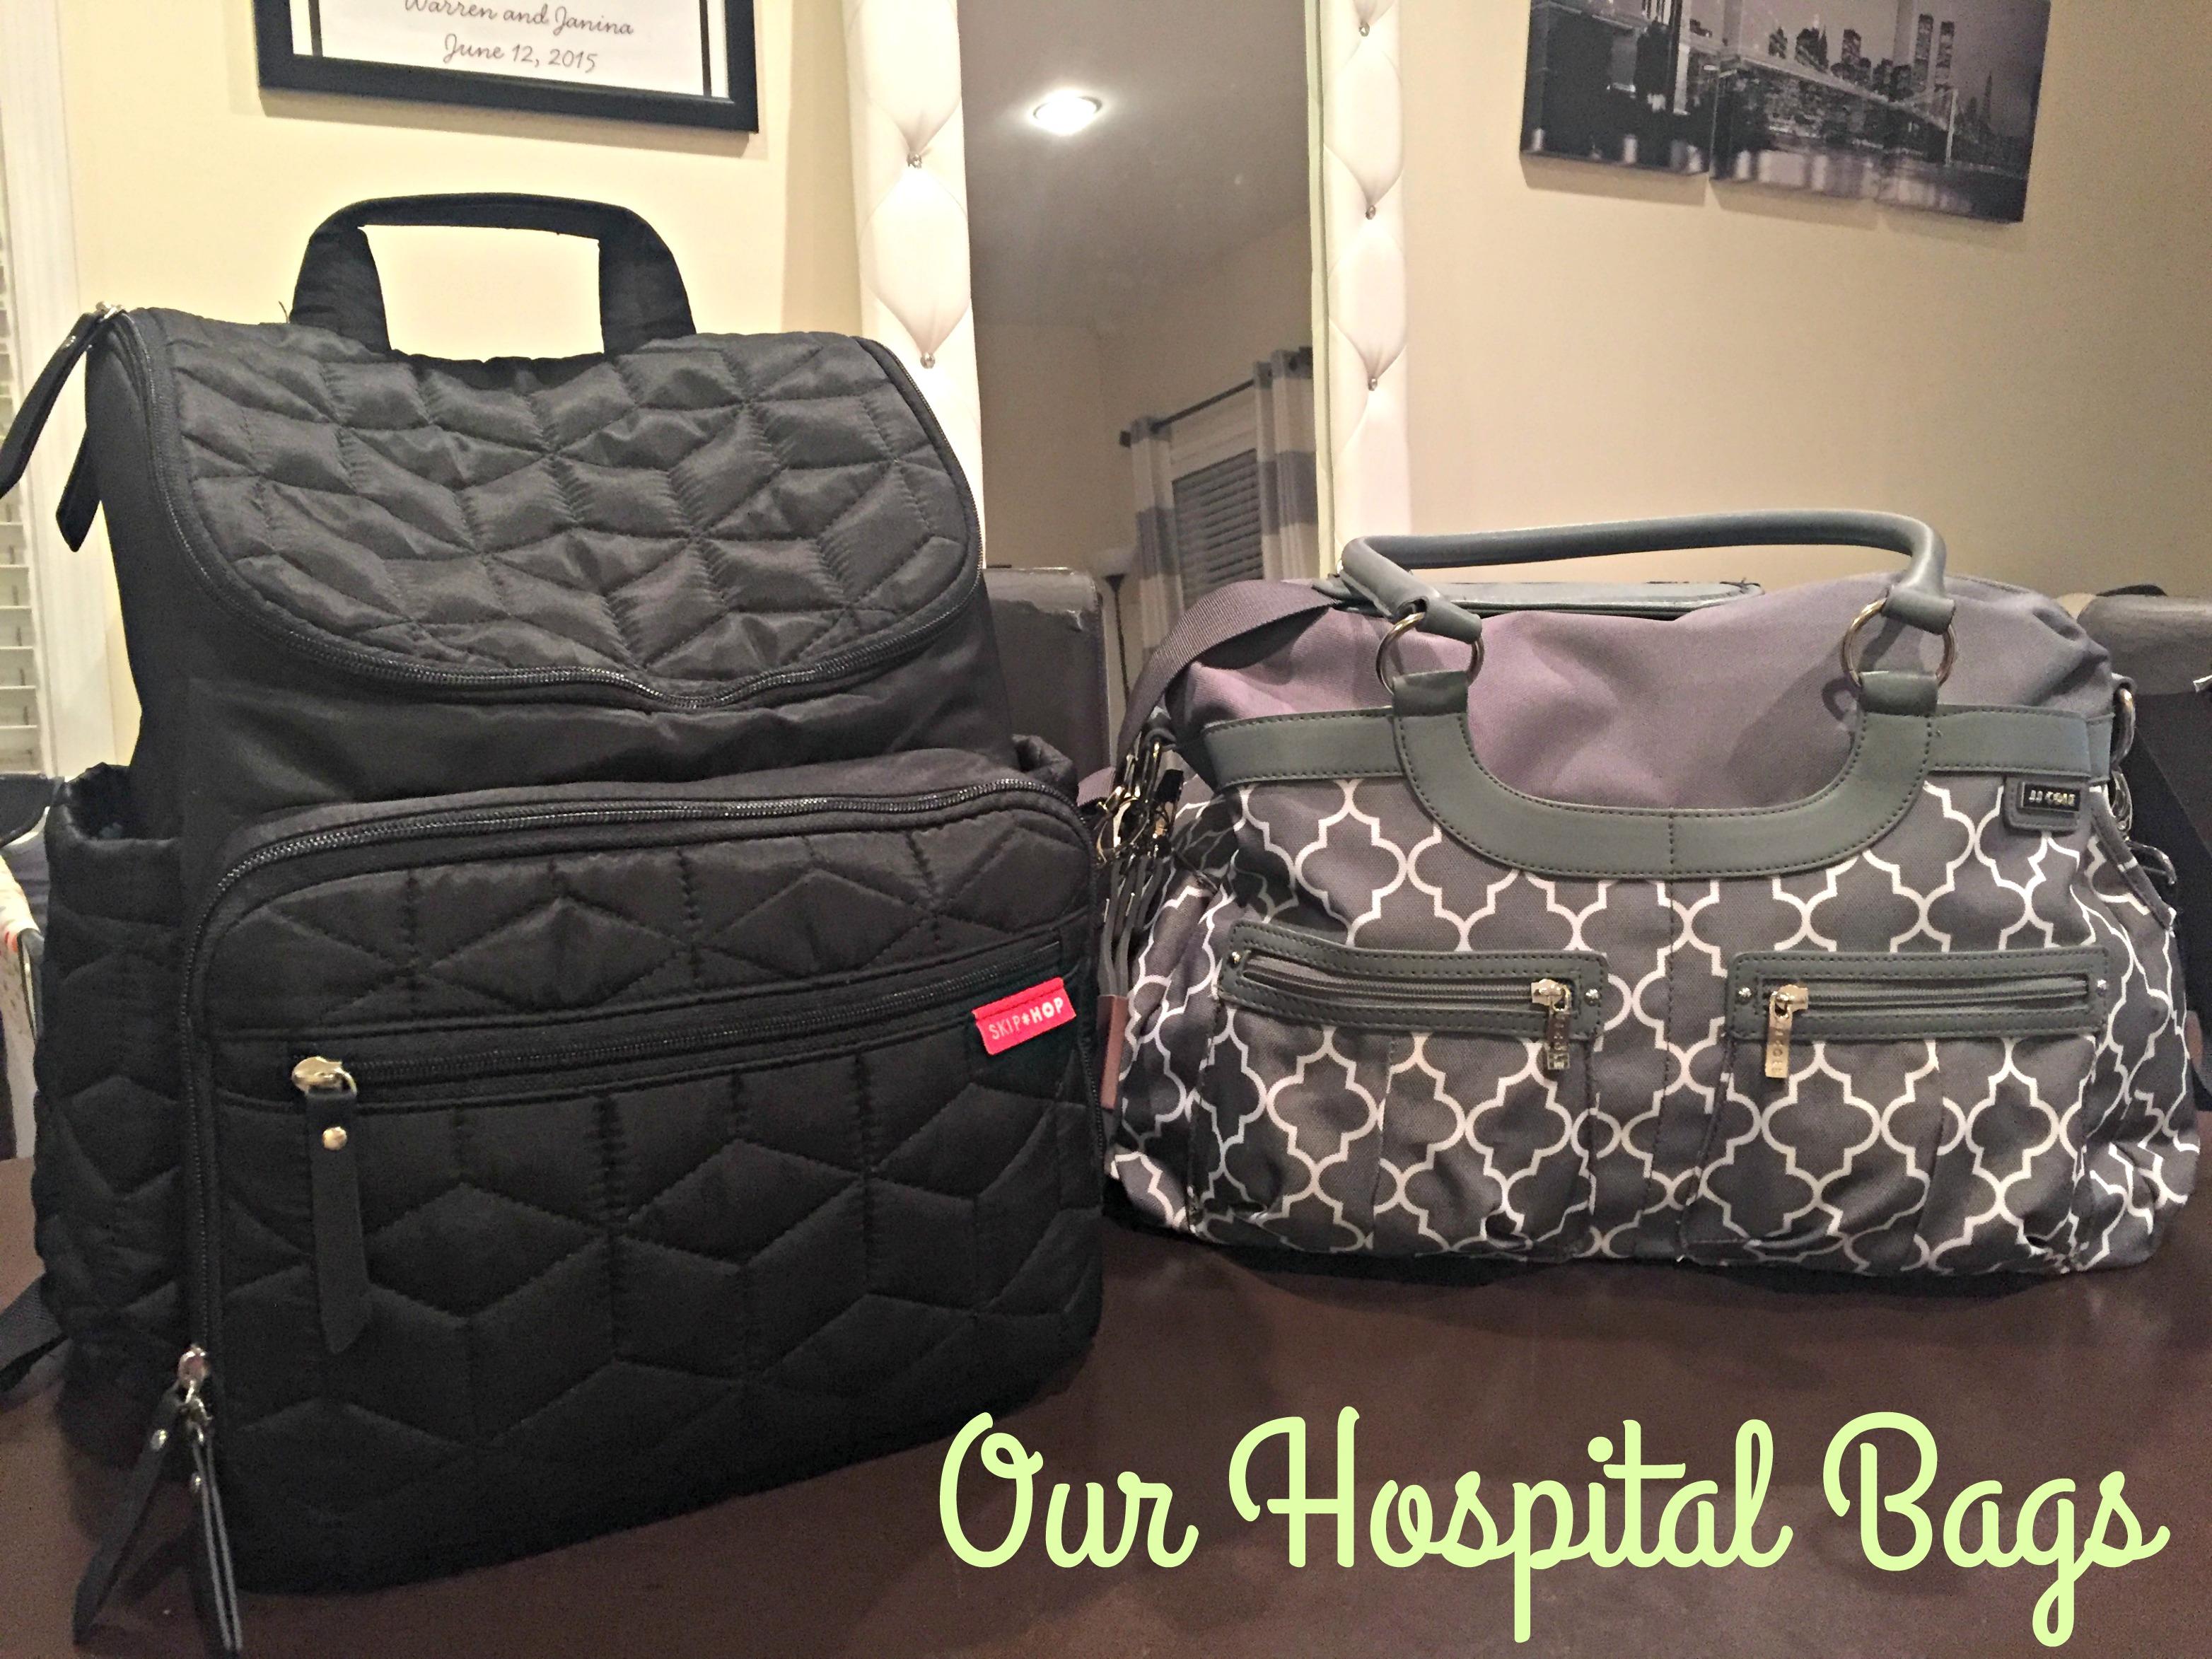 janinapaula.com/hospital bags